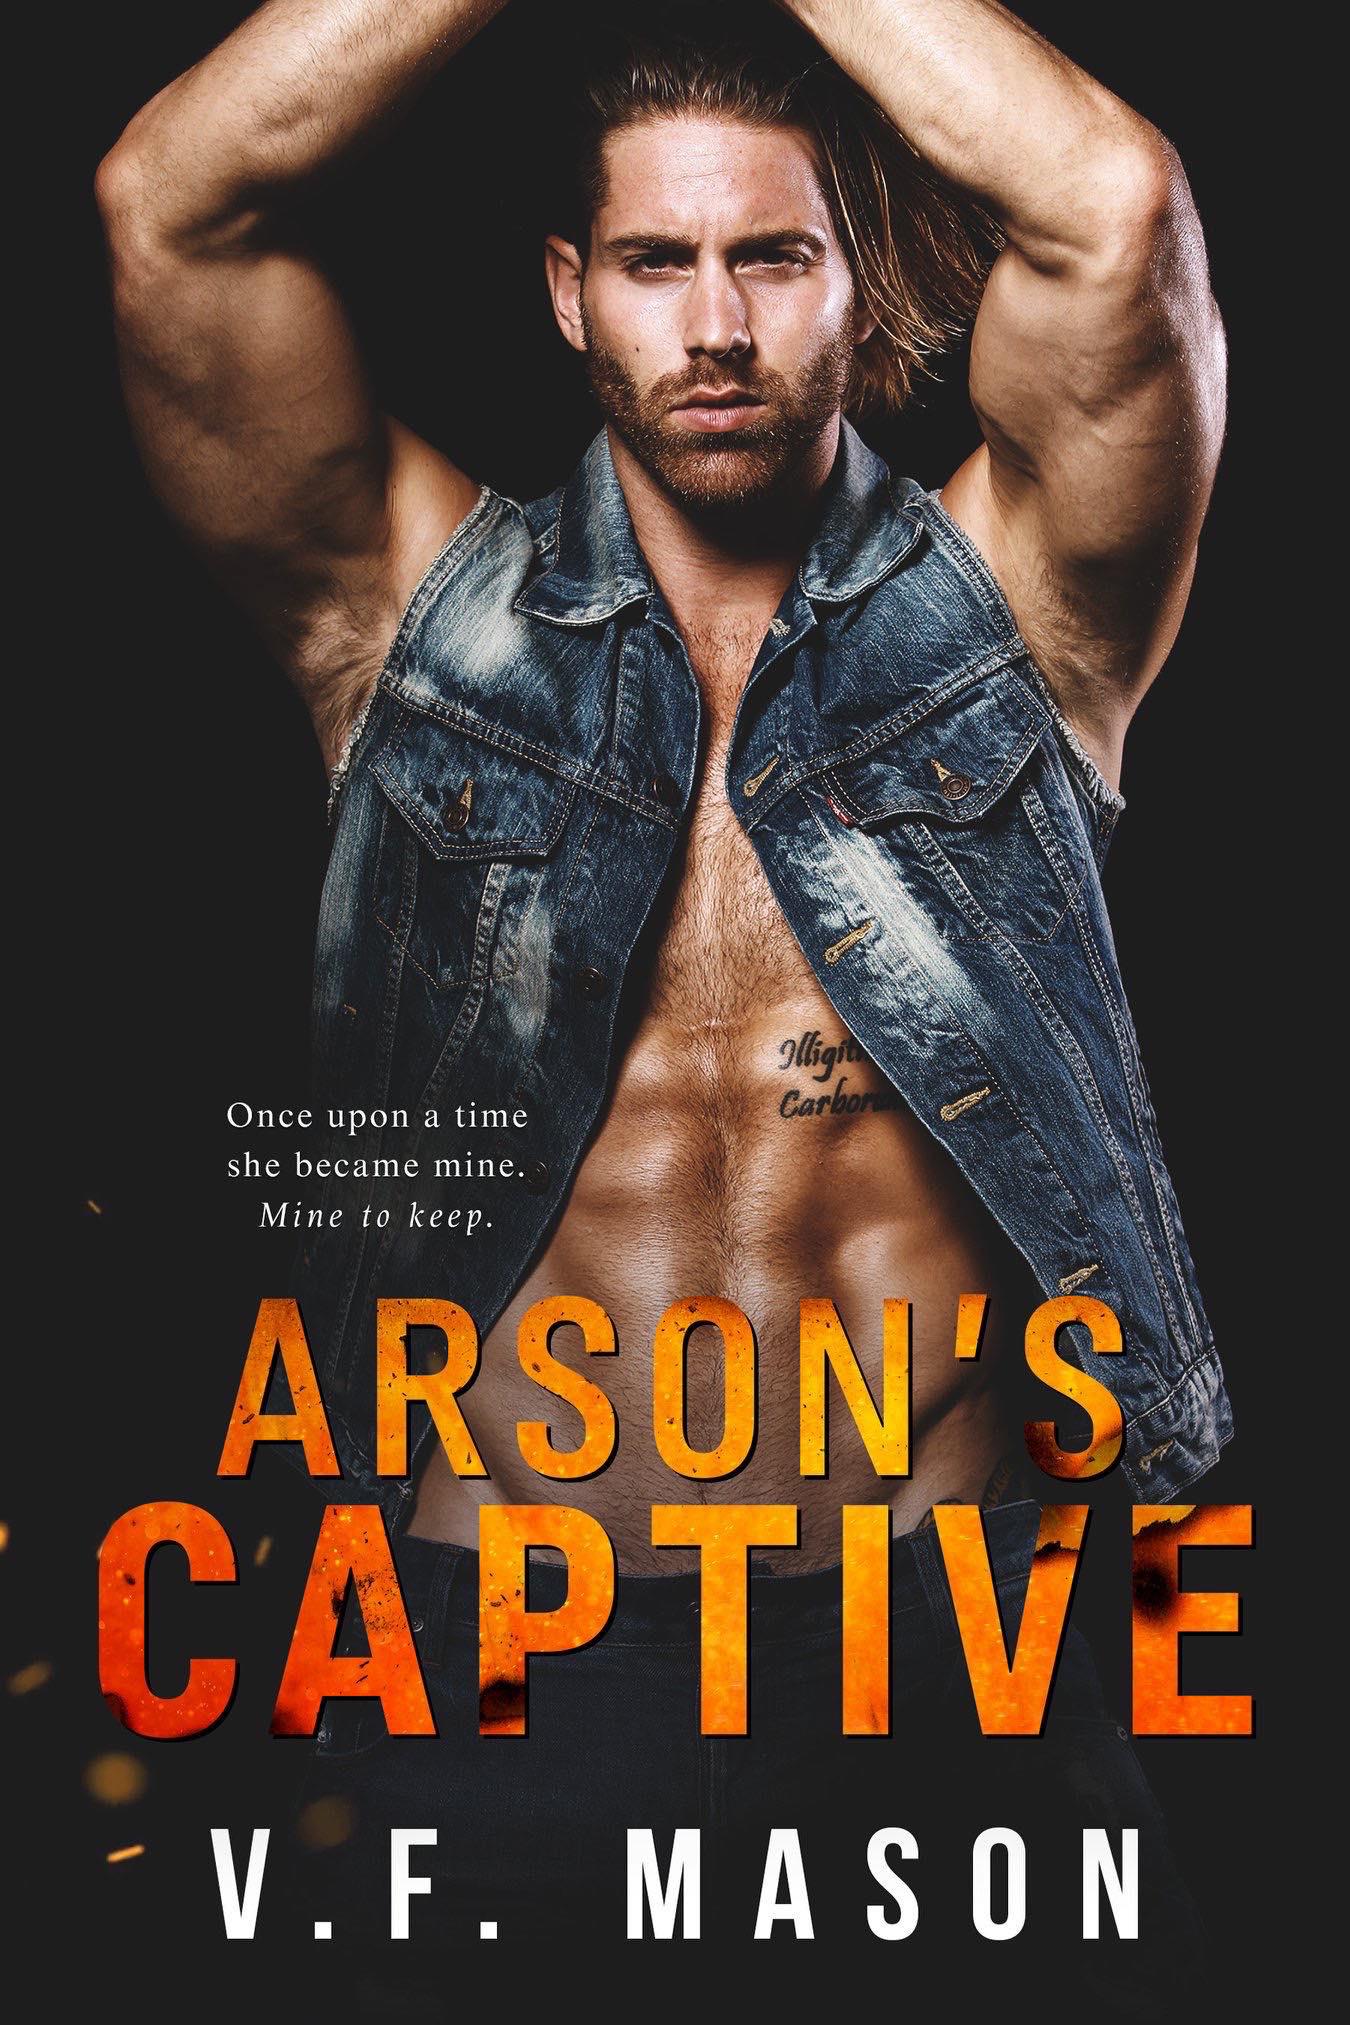 ARSON'S CAPTIVE